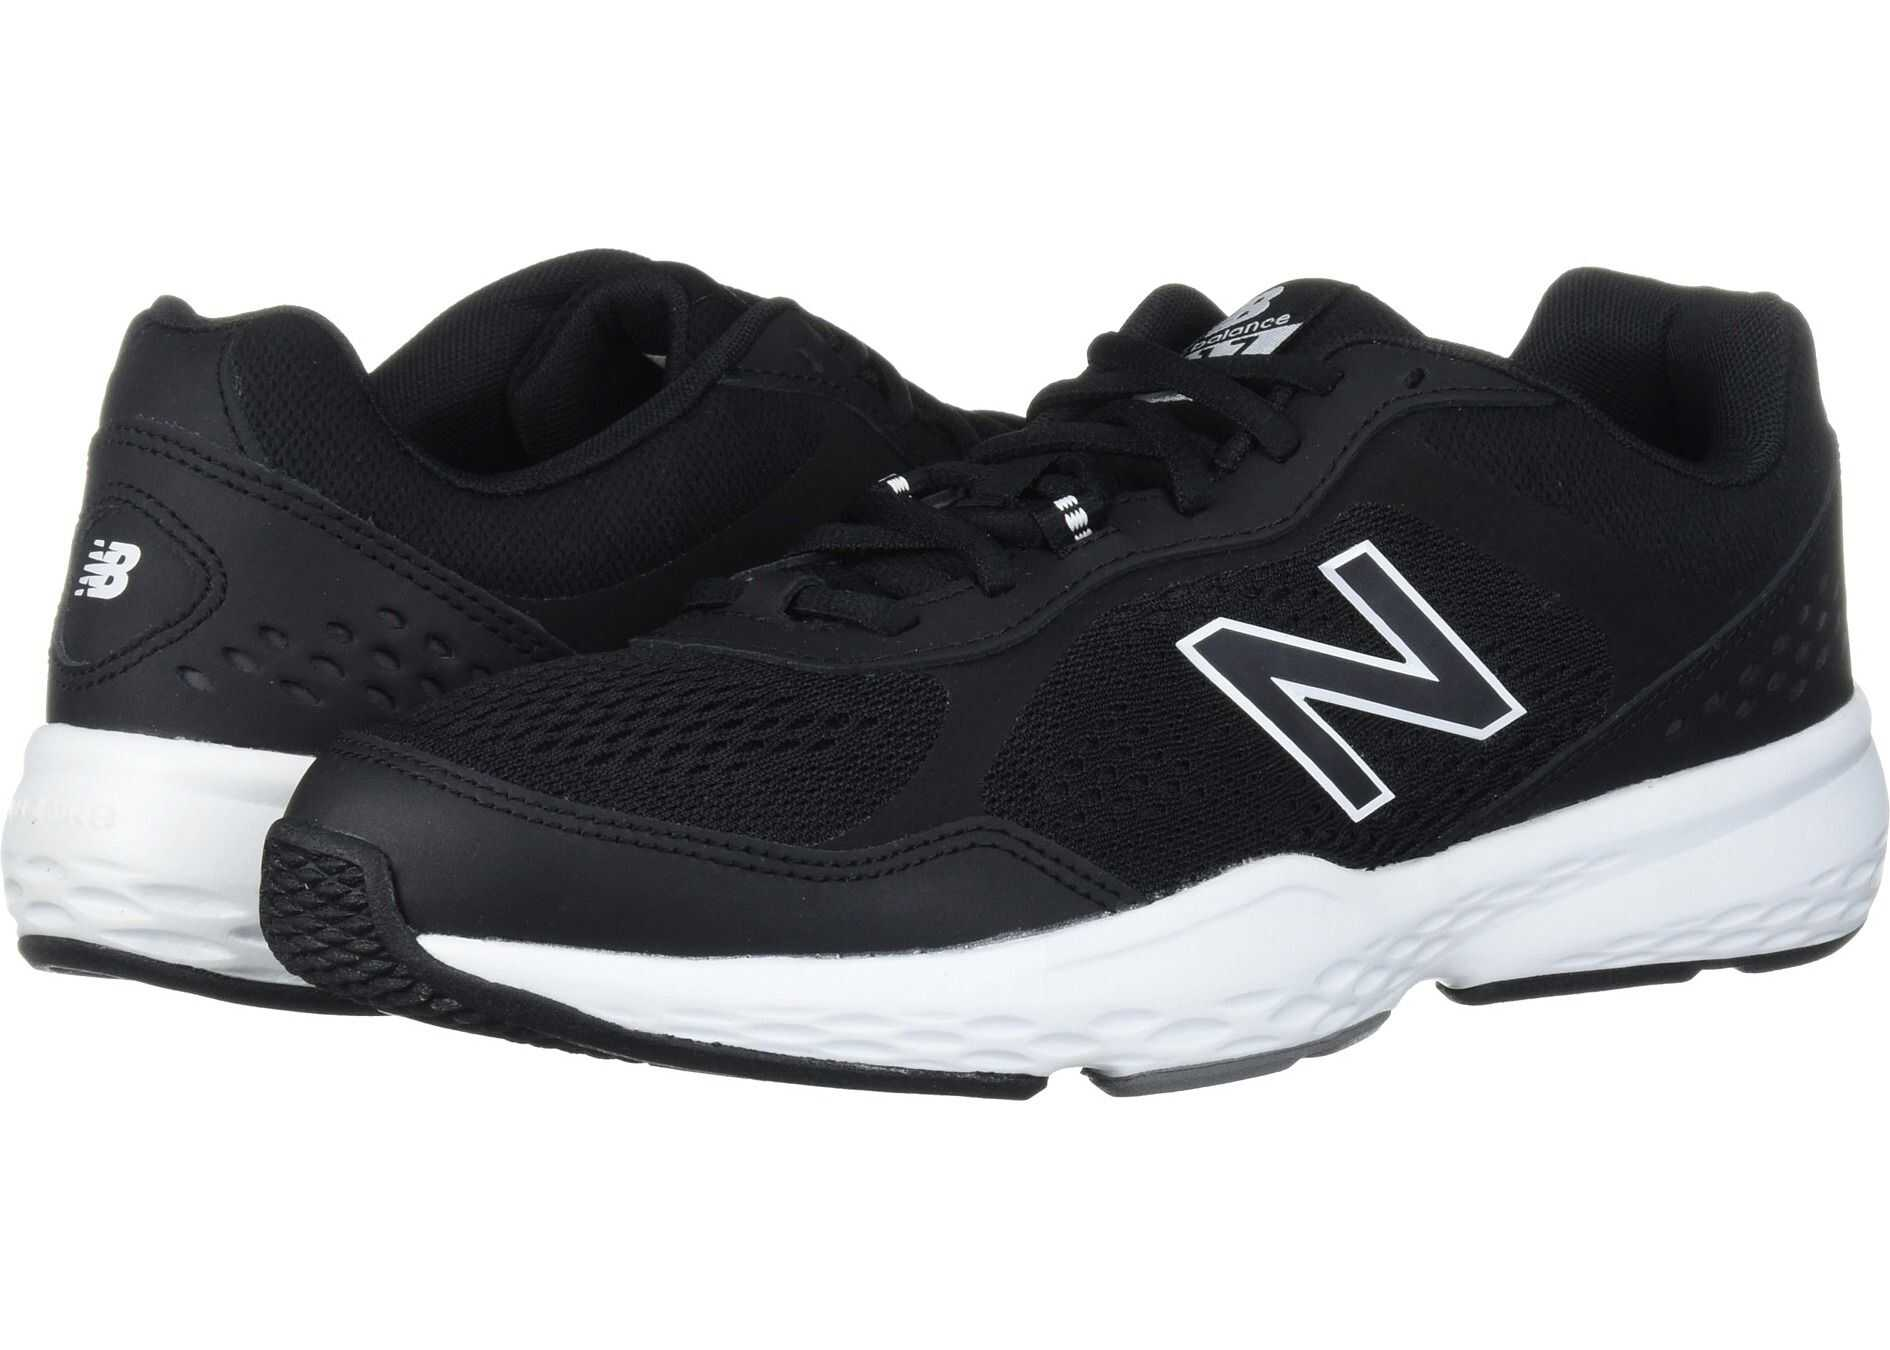 New Balance 517v2 Black/White